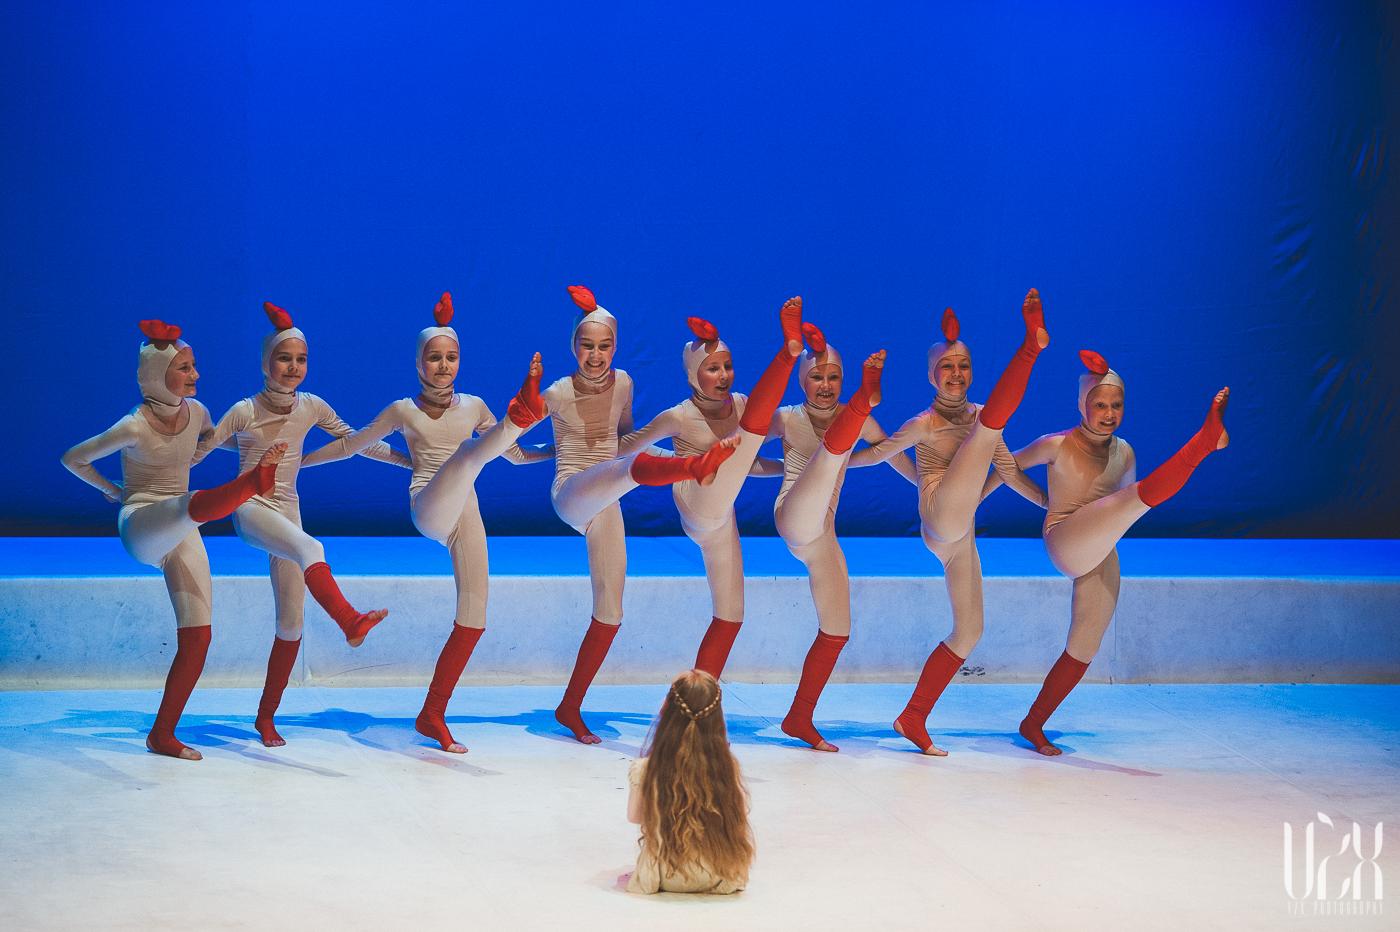 E.sabaliauskaite Vzx.lt Dance Judesio Erdve 12